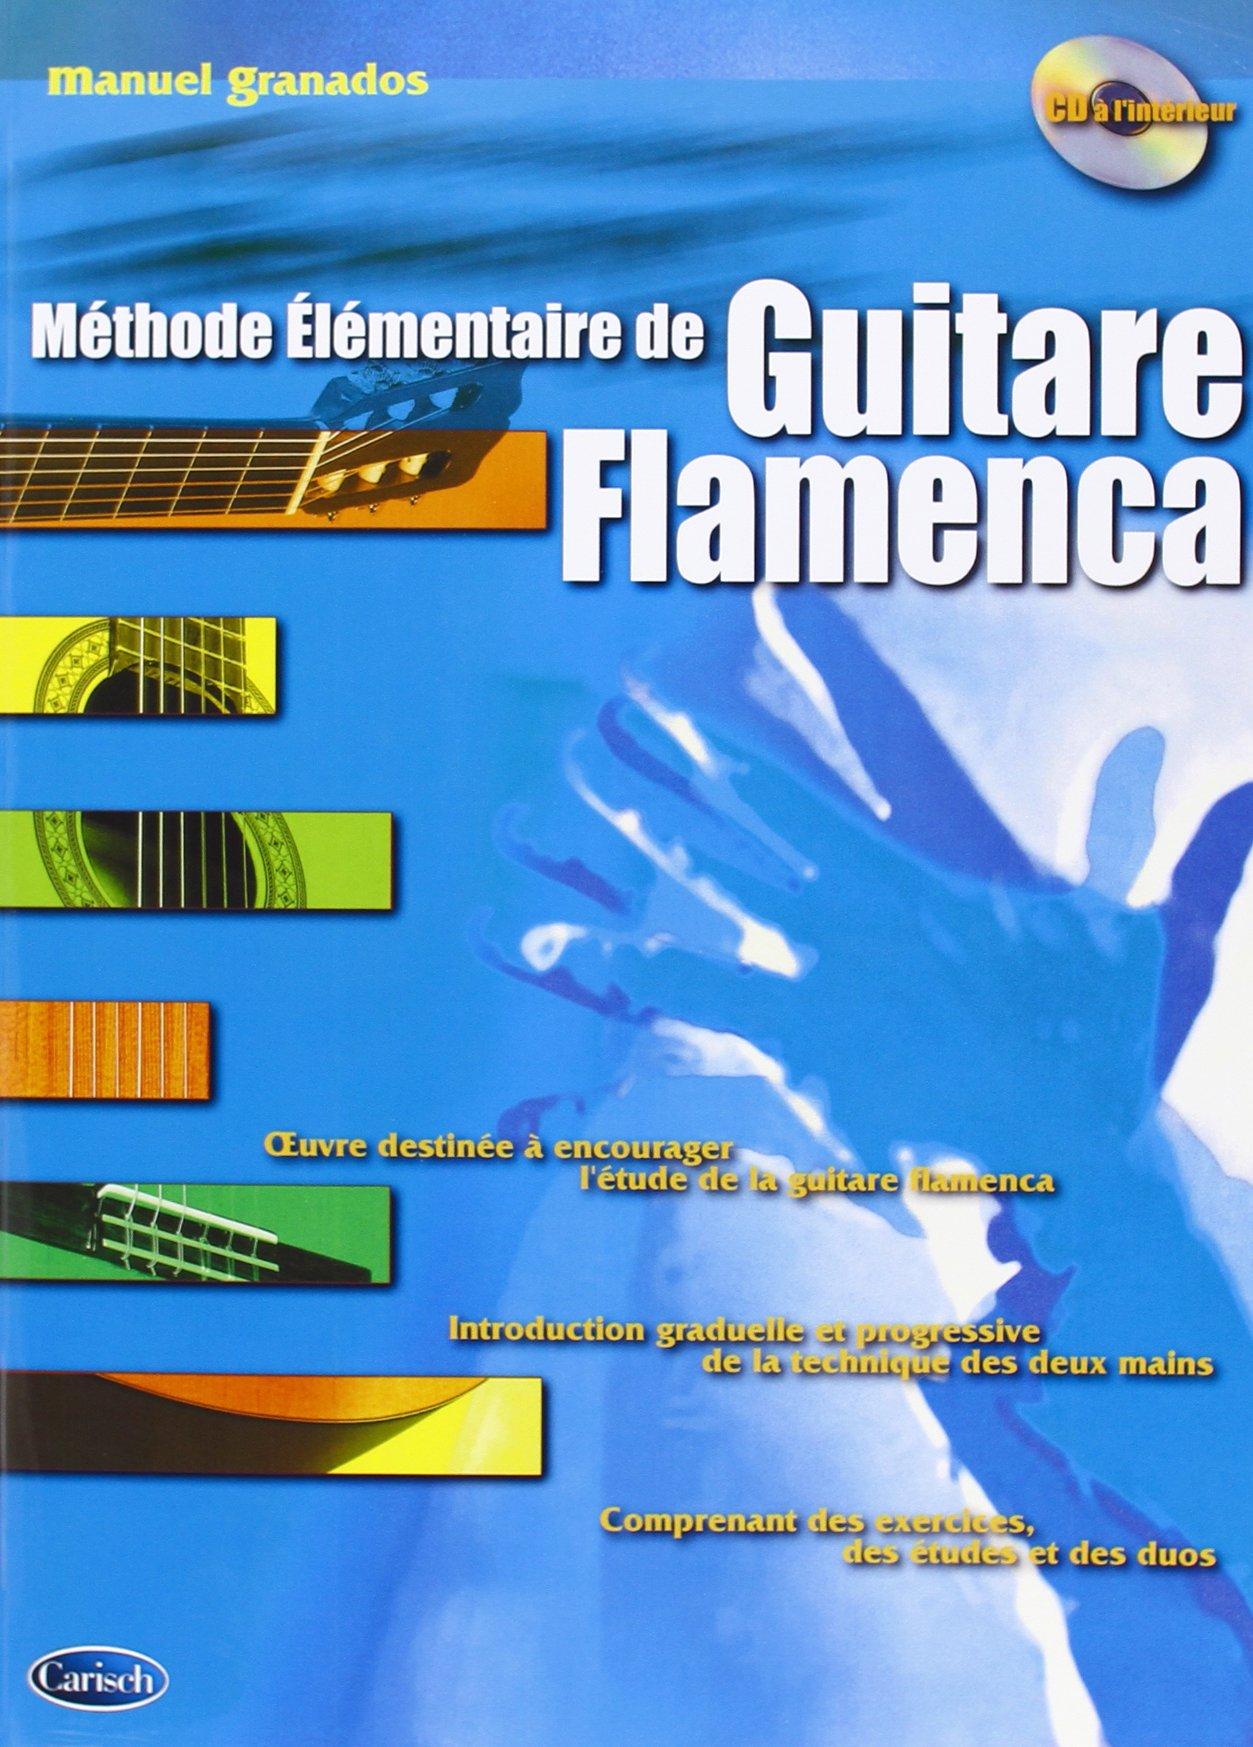 Granados Manuel Methode Elementaire De Guitare Flamenca Gtr Bk/Cd Fre